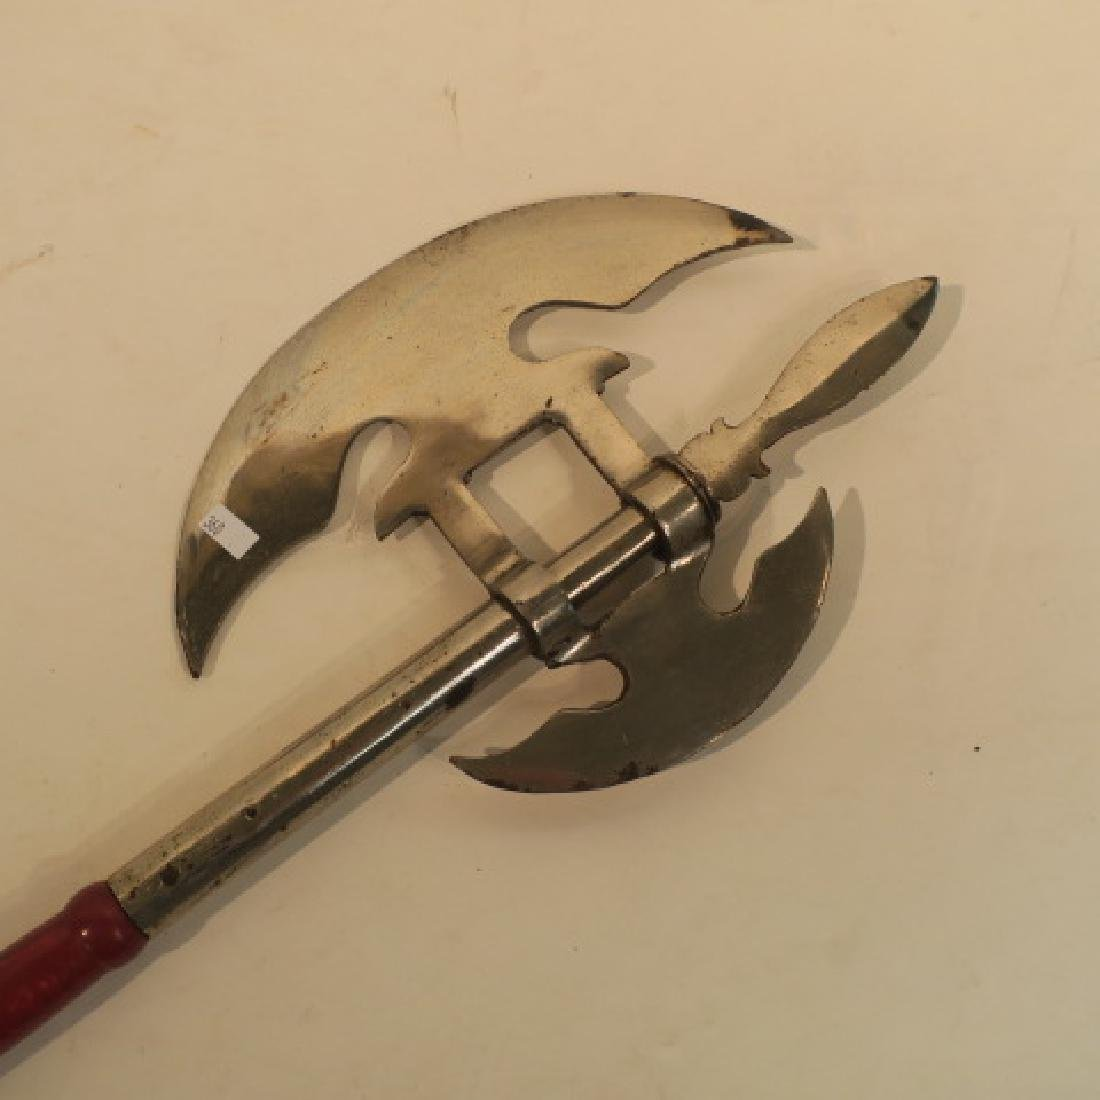 Battle Axe with Halberd Style Axe Head: - 2